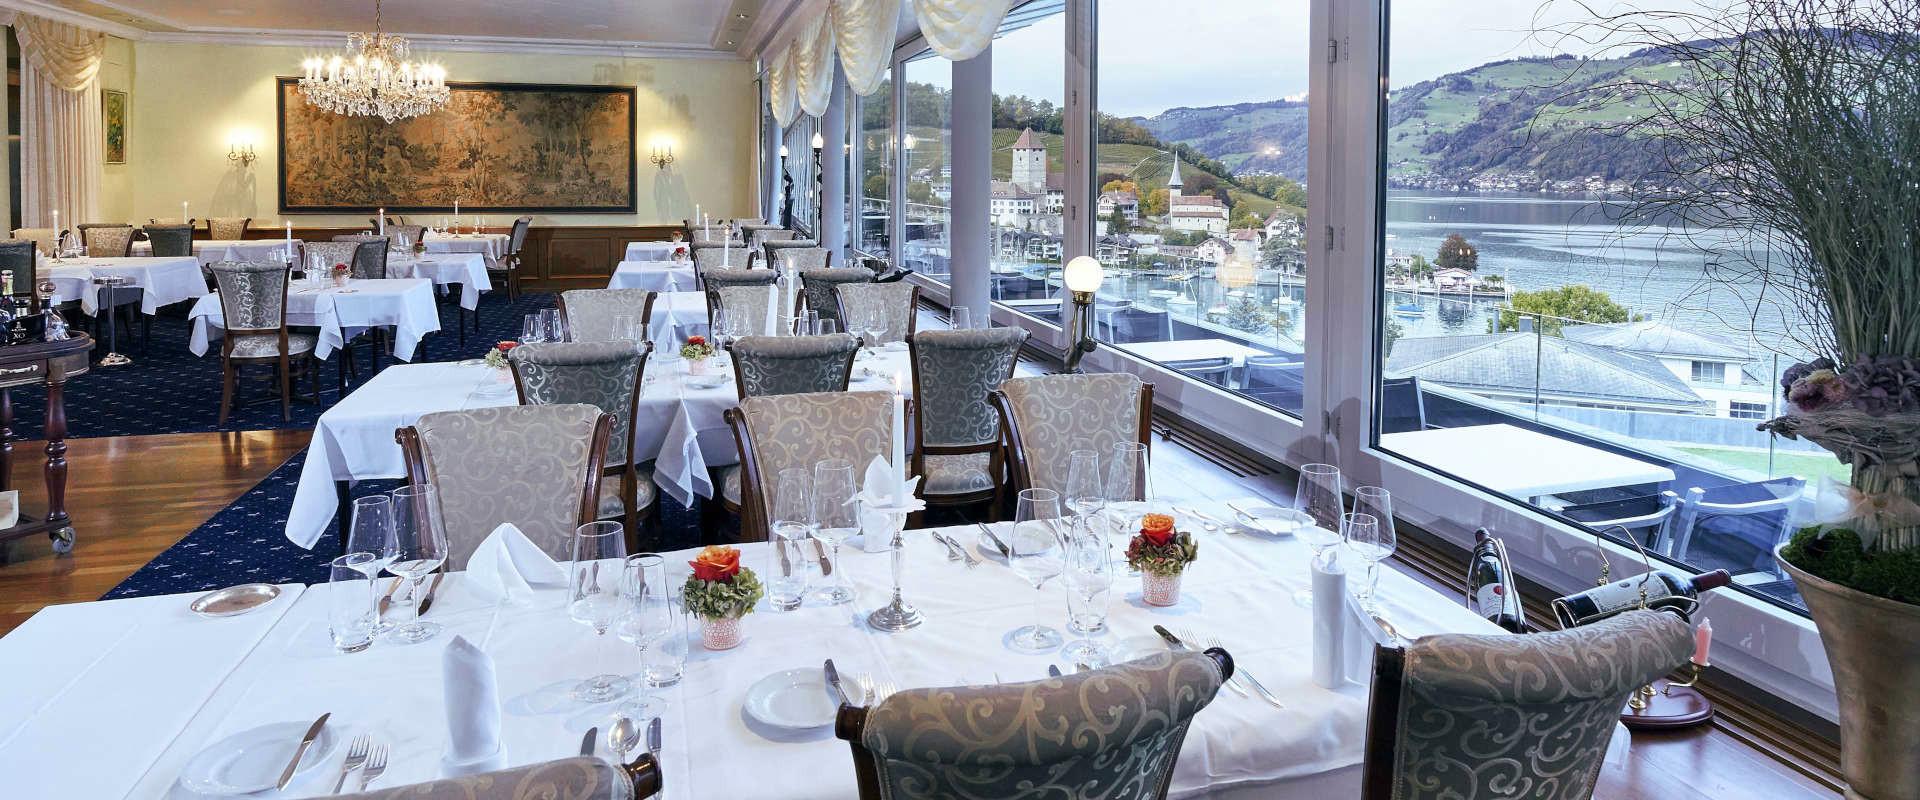 Speisesaal Restaurant Belvédère Spiez